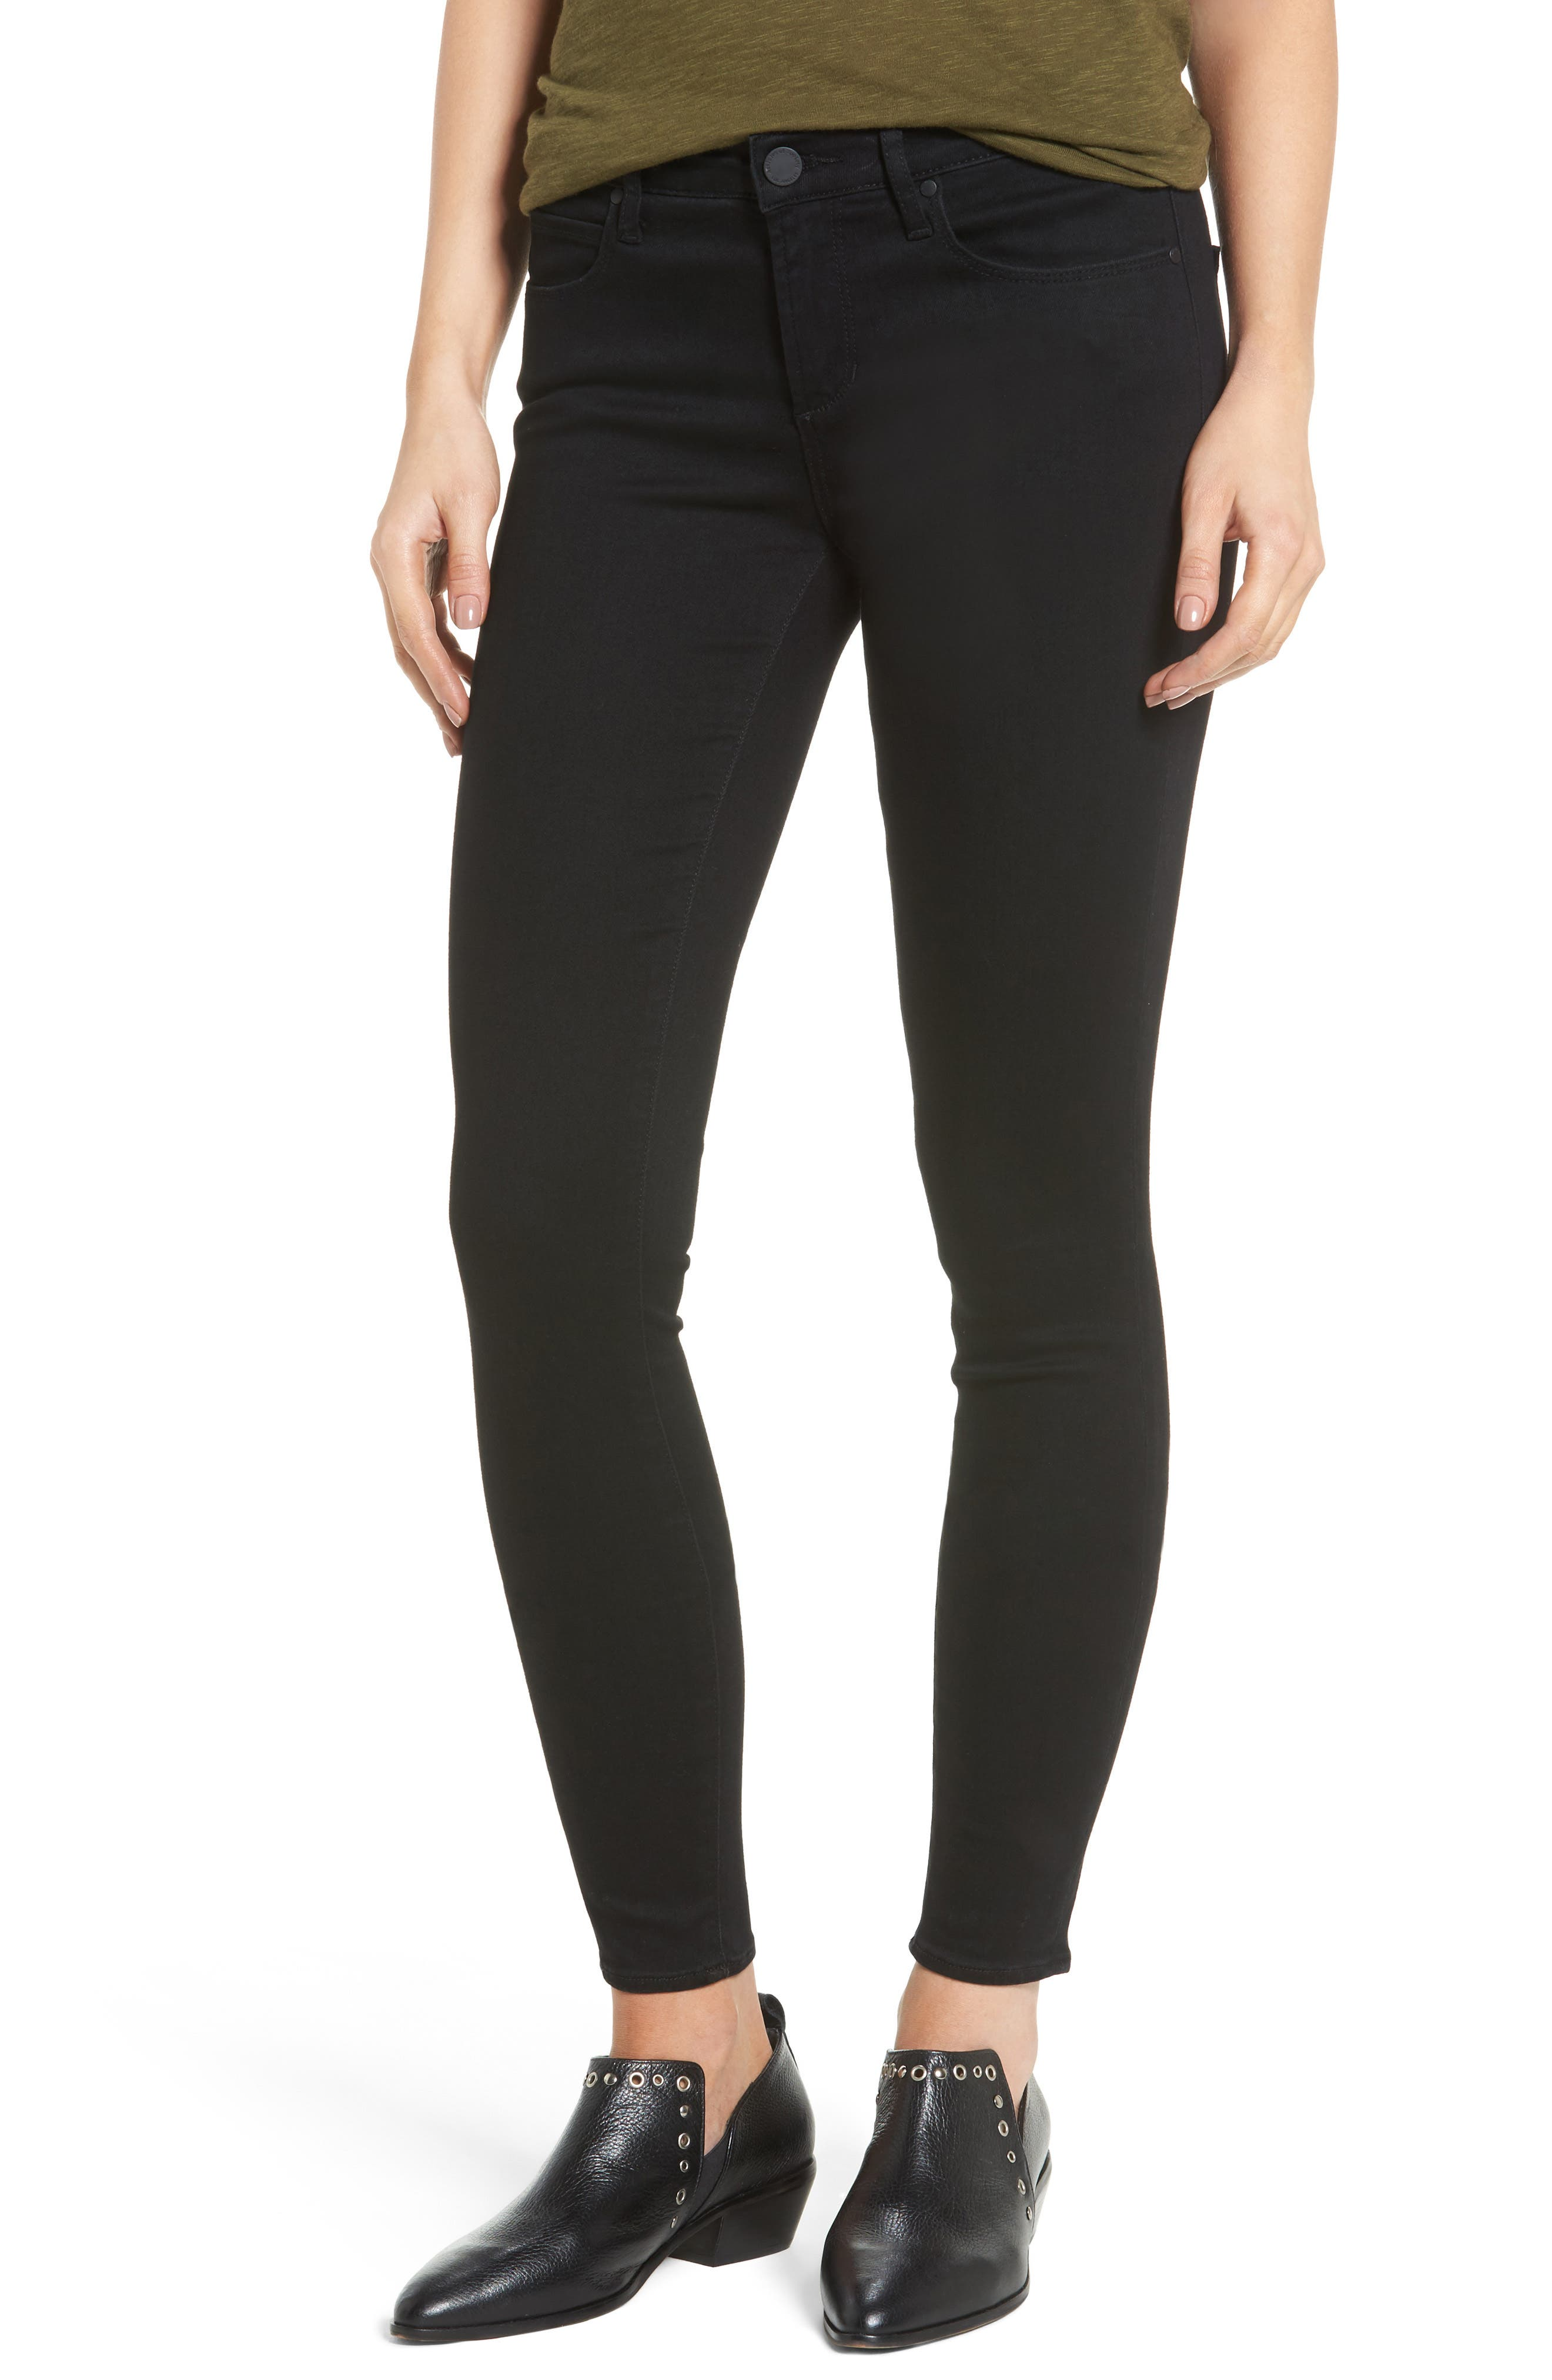 Articles of Society Sarah Ankle Skinny Jeans (Asphalt)